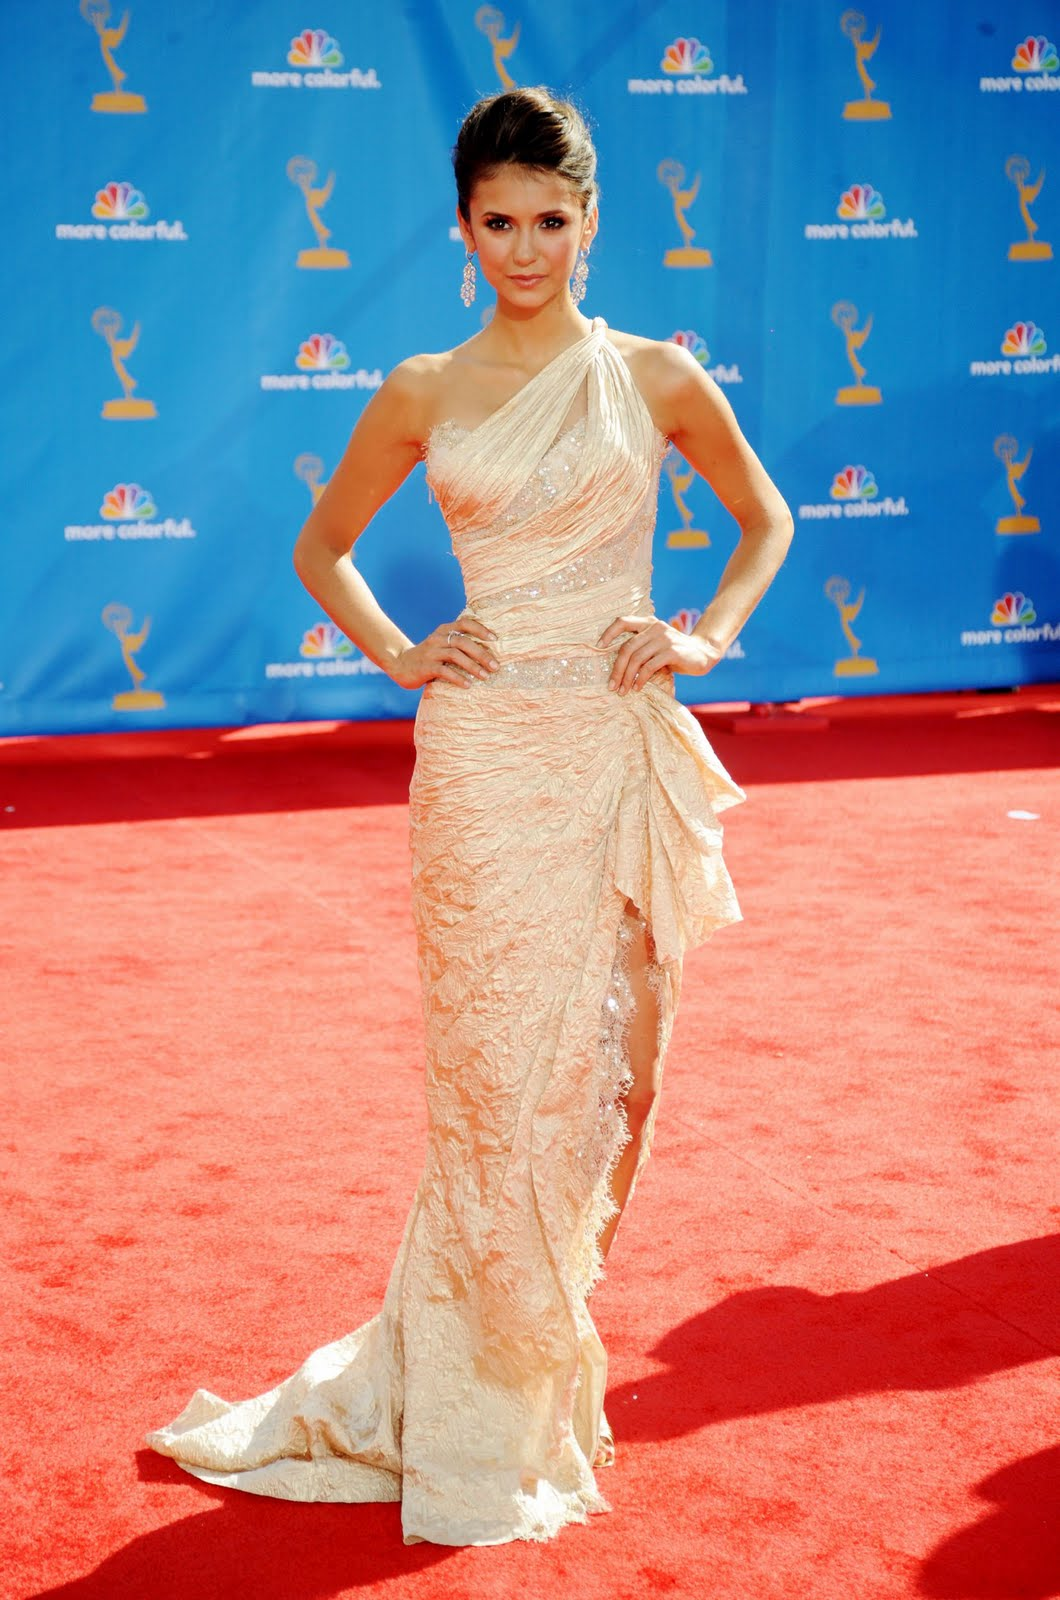 http://1.bp.blogspot.com/_zTnUlG3Oh58/THvaBbdCRvI/AAAAAAAAAIs/7QOOxEHGdZE/s1600/nina-dobrev-2010-emmy-awards-2.jpg